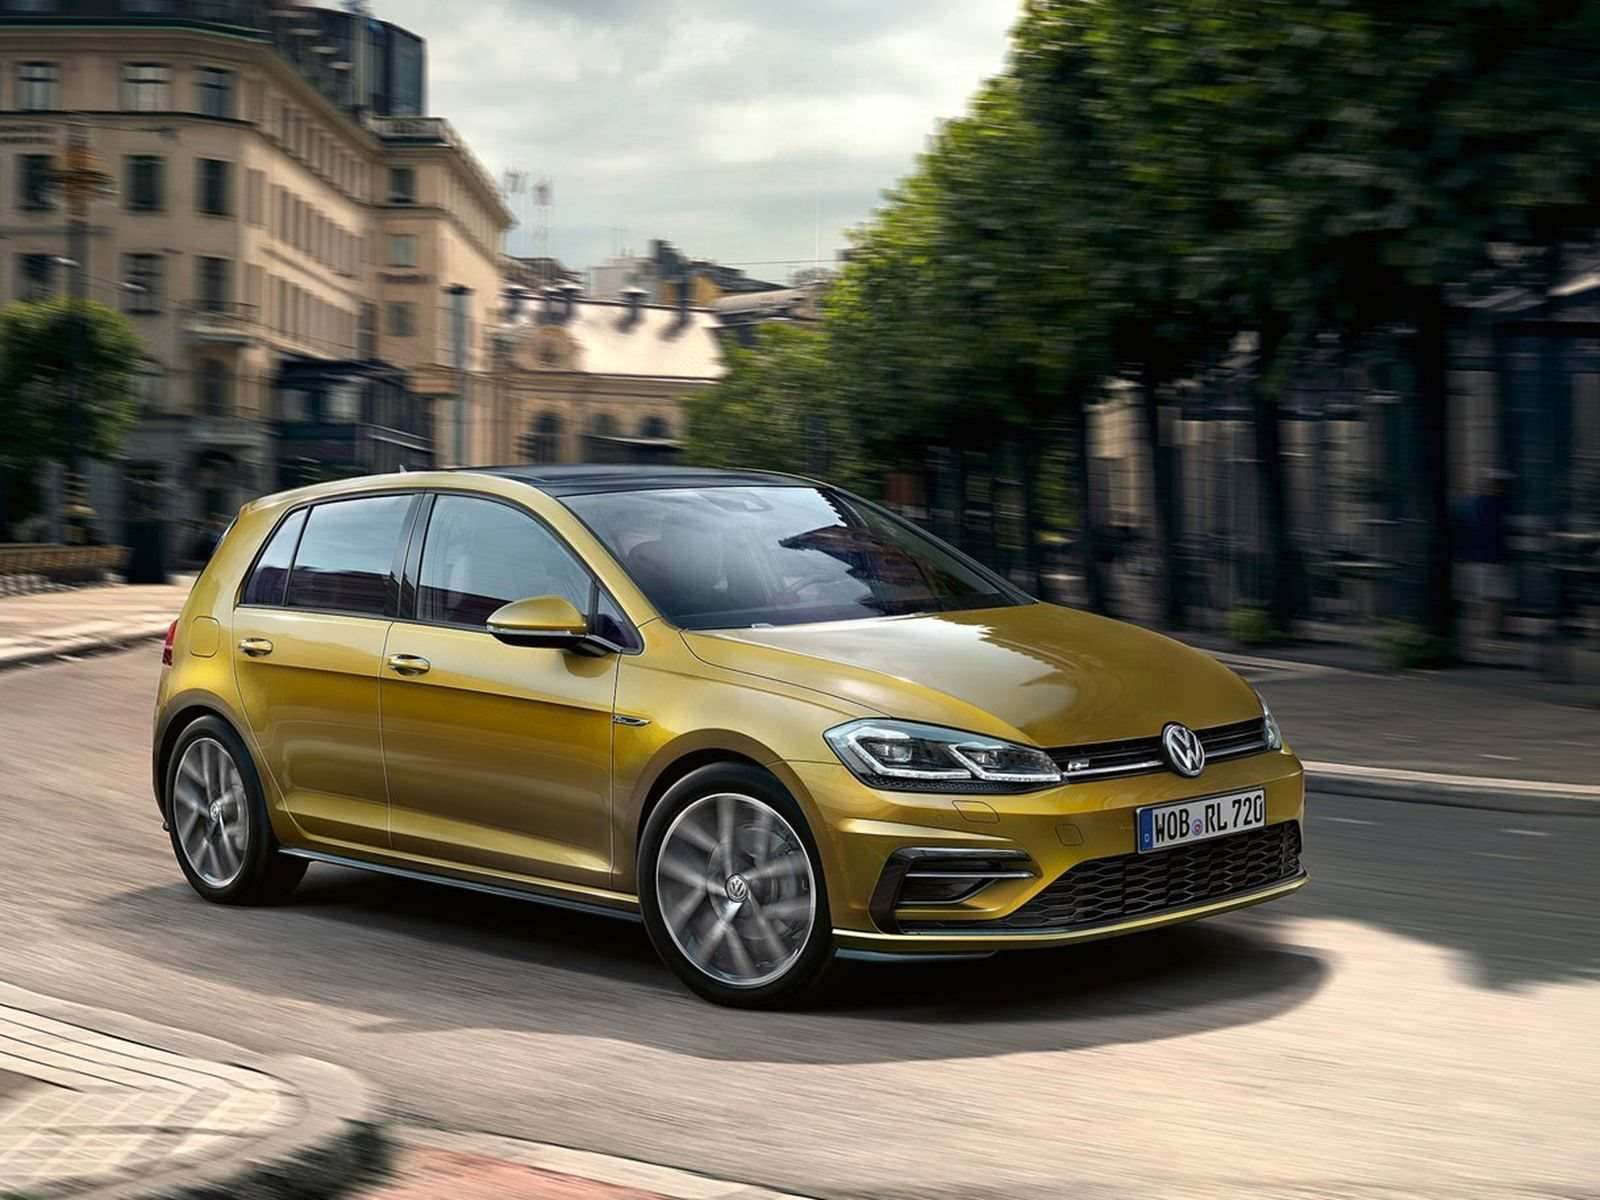 64 Best Review The Volkswagen E Up 2019 Rumor Redesign with The Volkswagen E Up 2019 Rumor